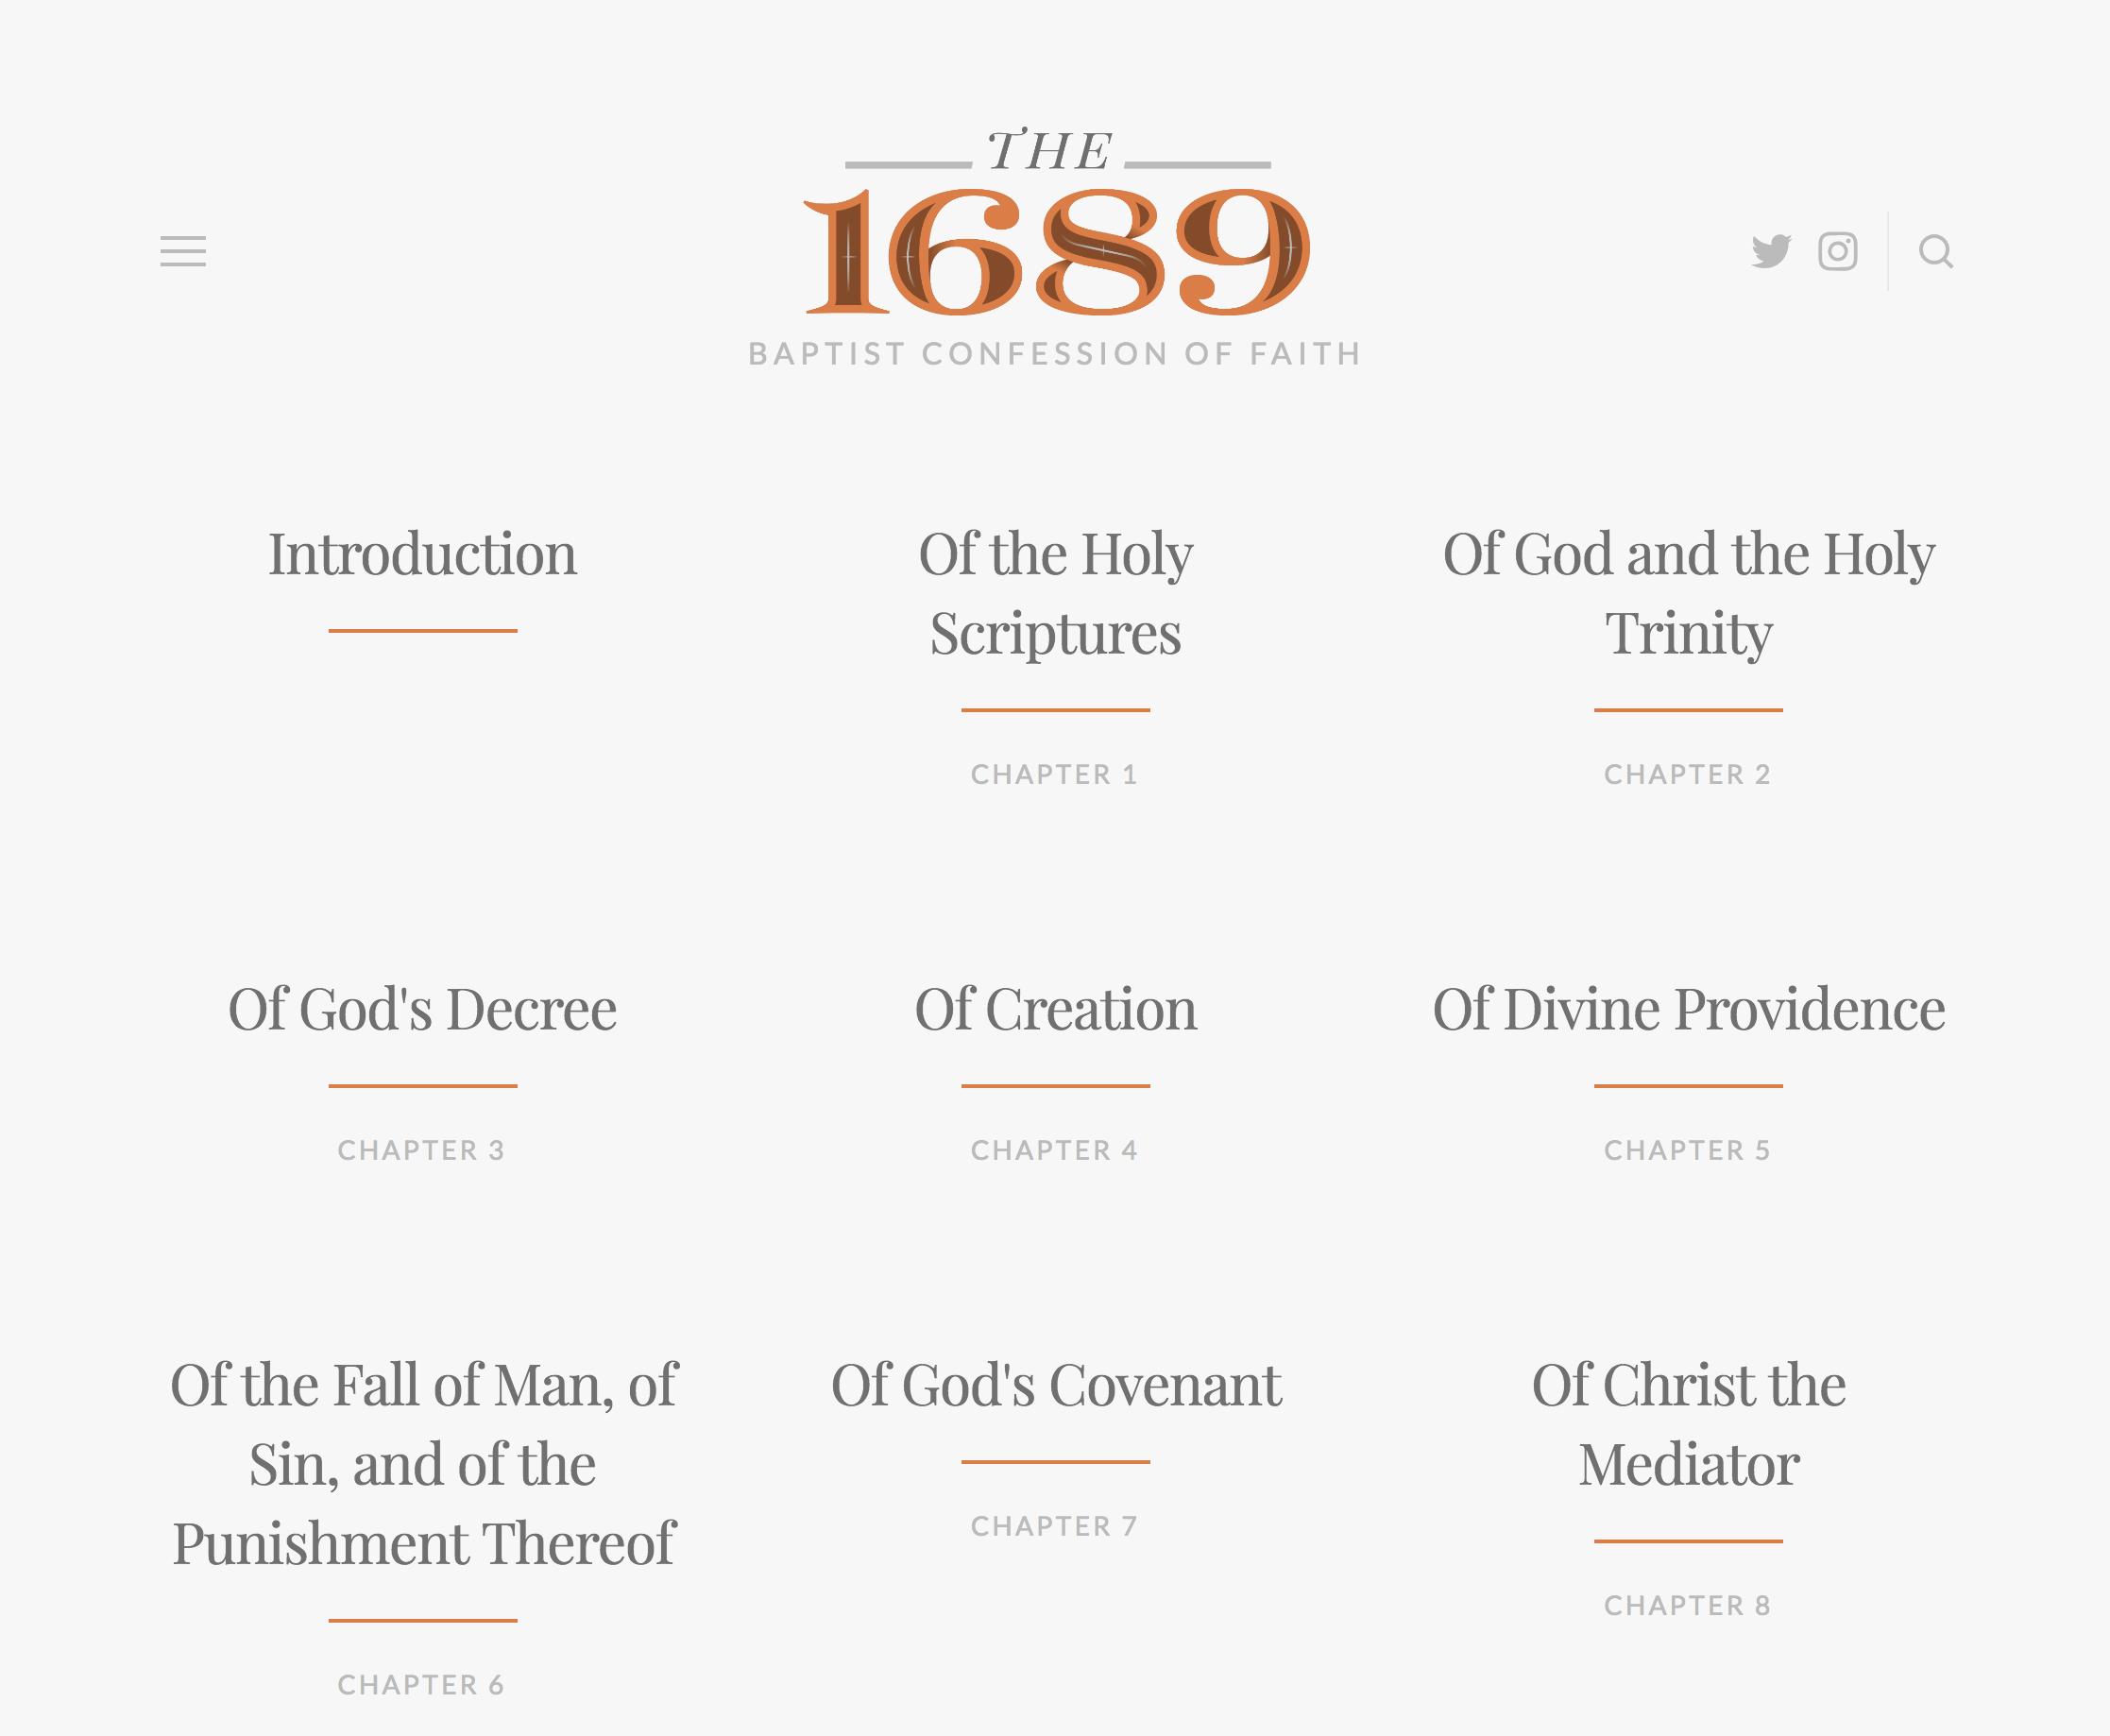 1689-screenshot.png